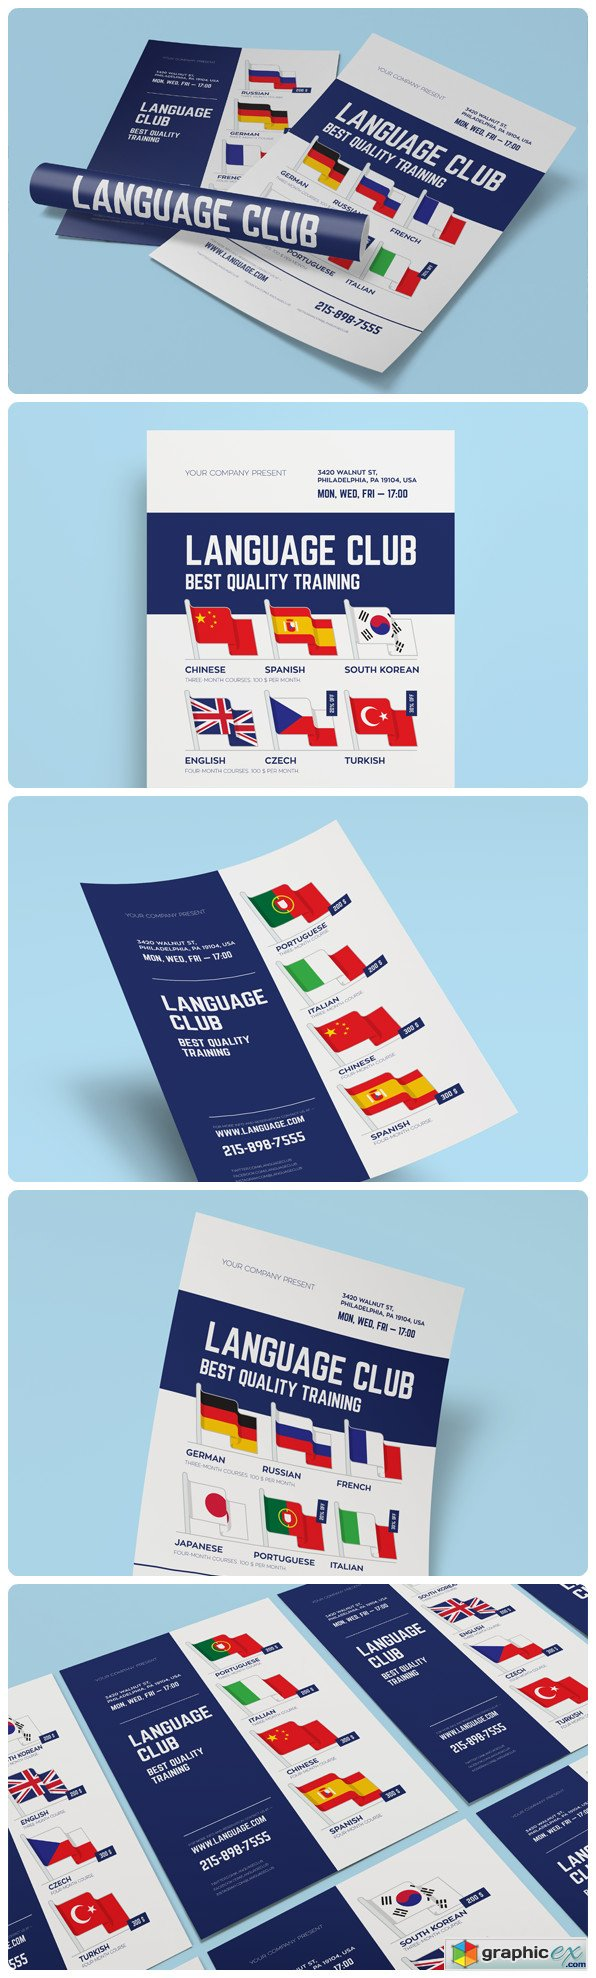 Travlang Language and Travel Resources